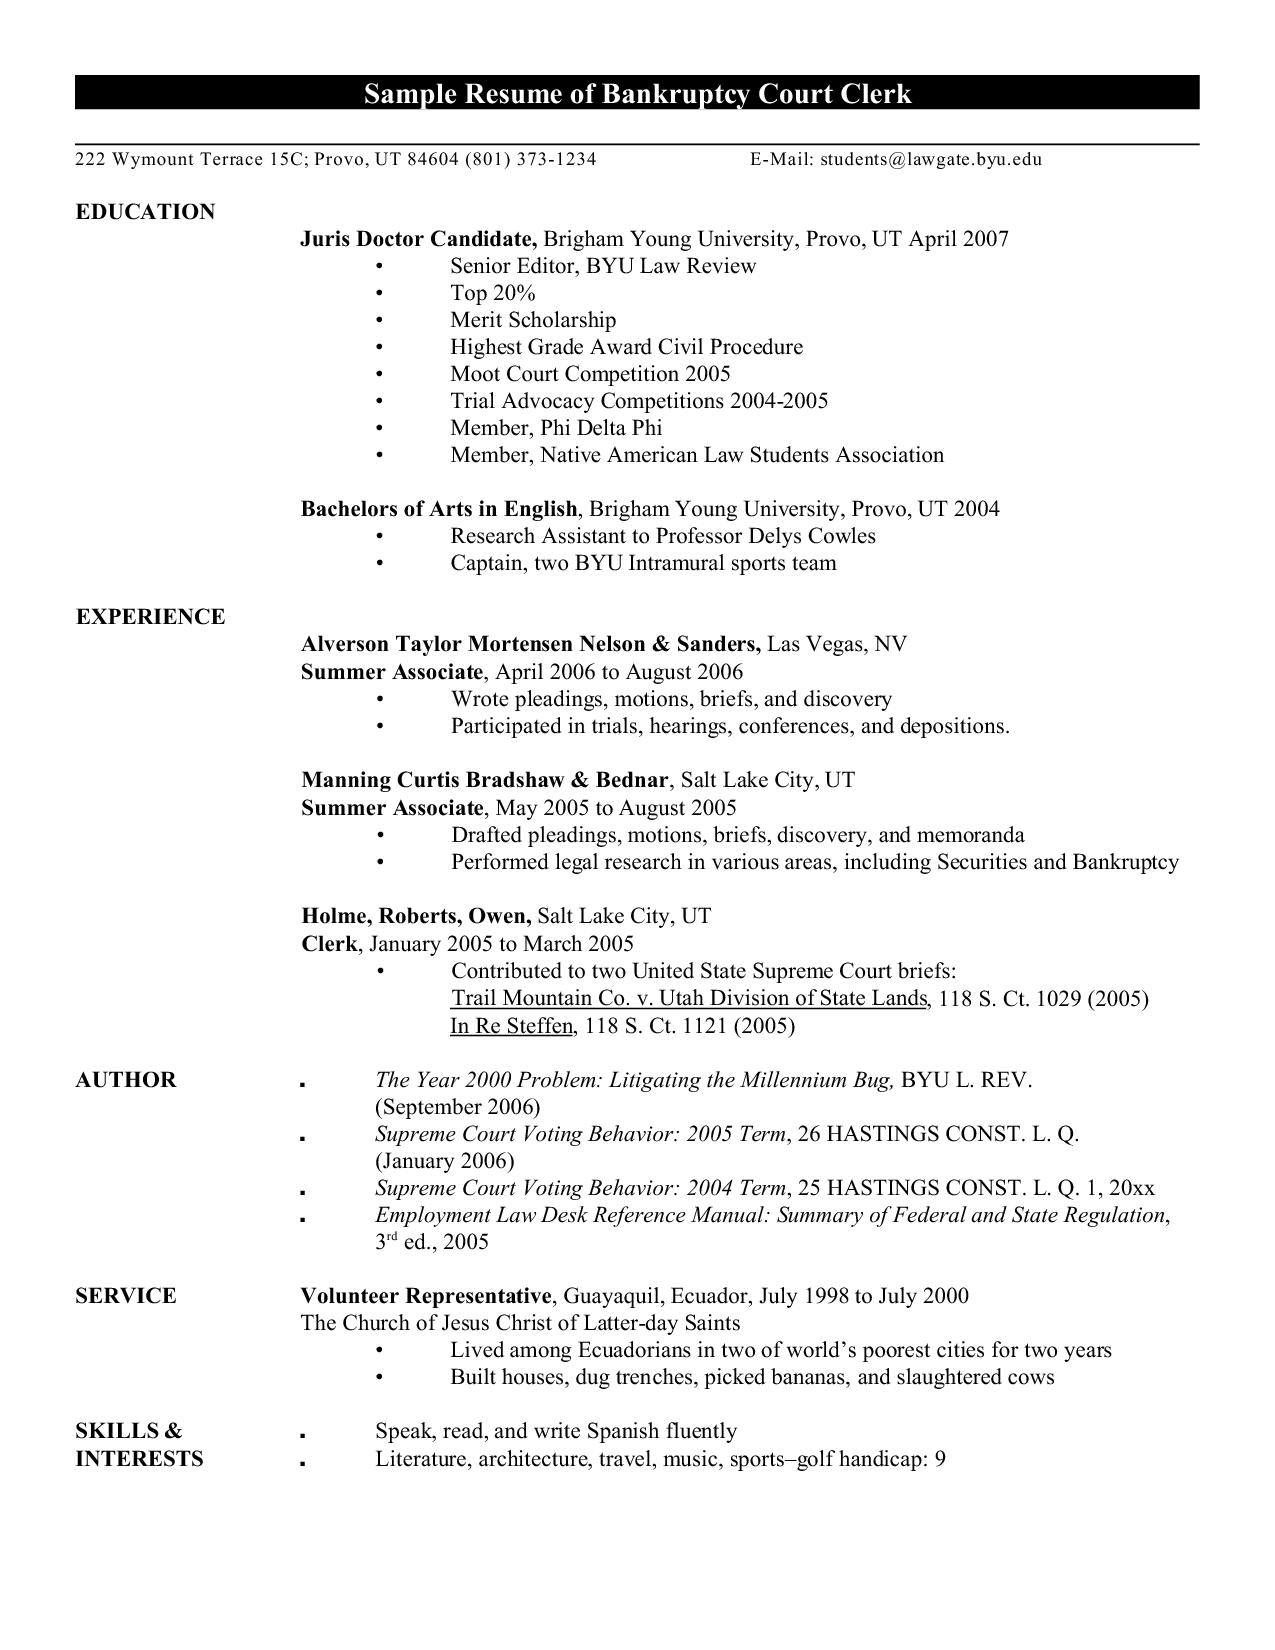 Resume Examples Byu , examples resume ResumeExamples